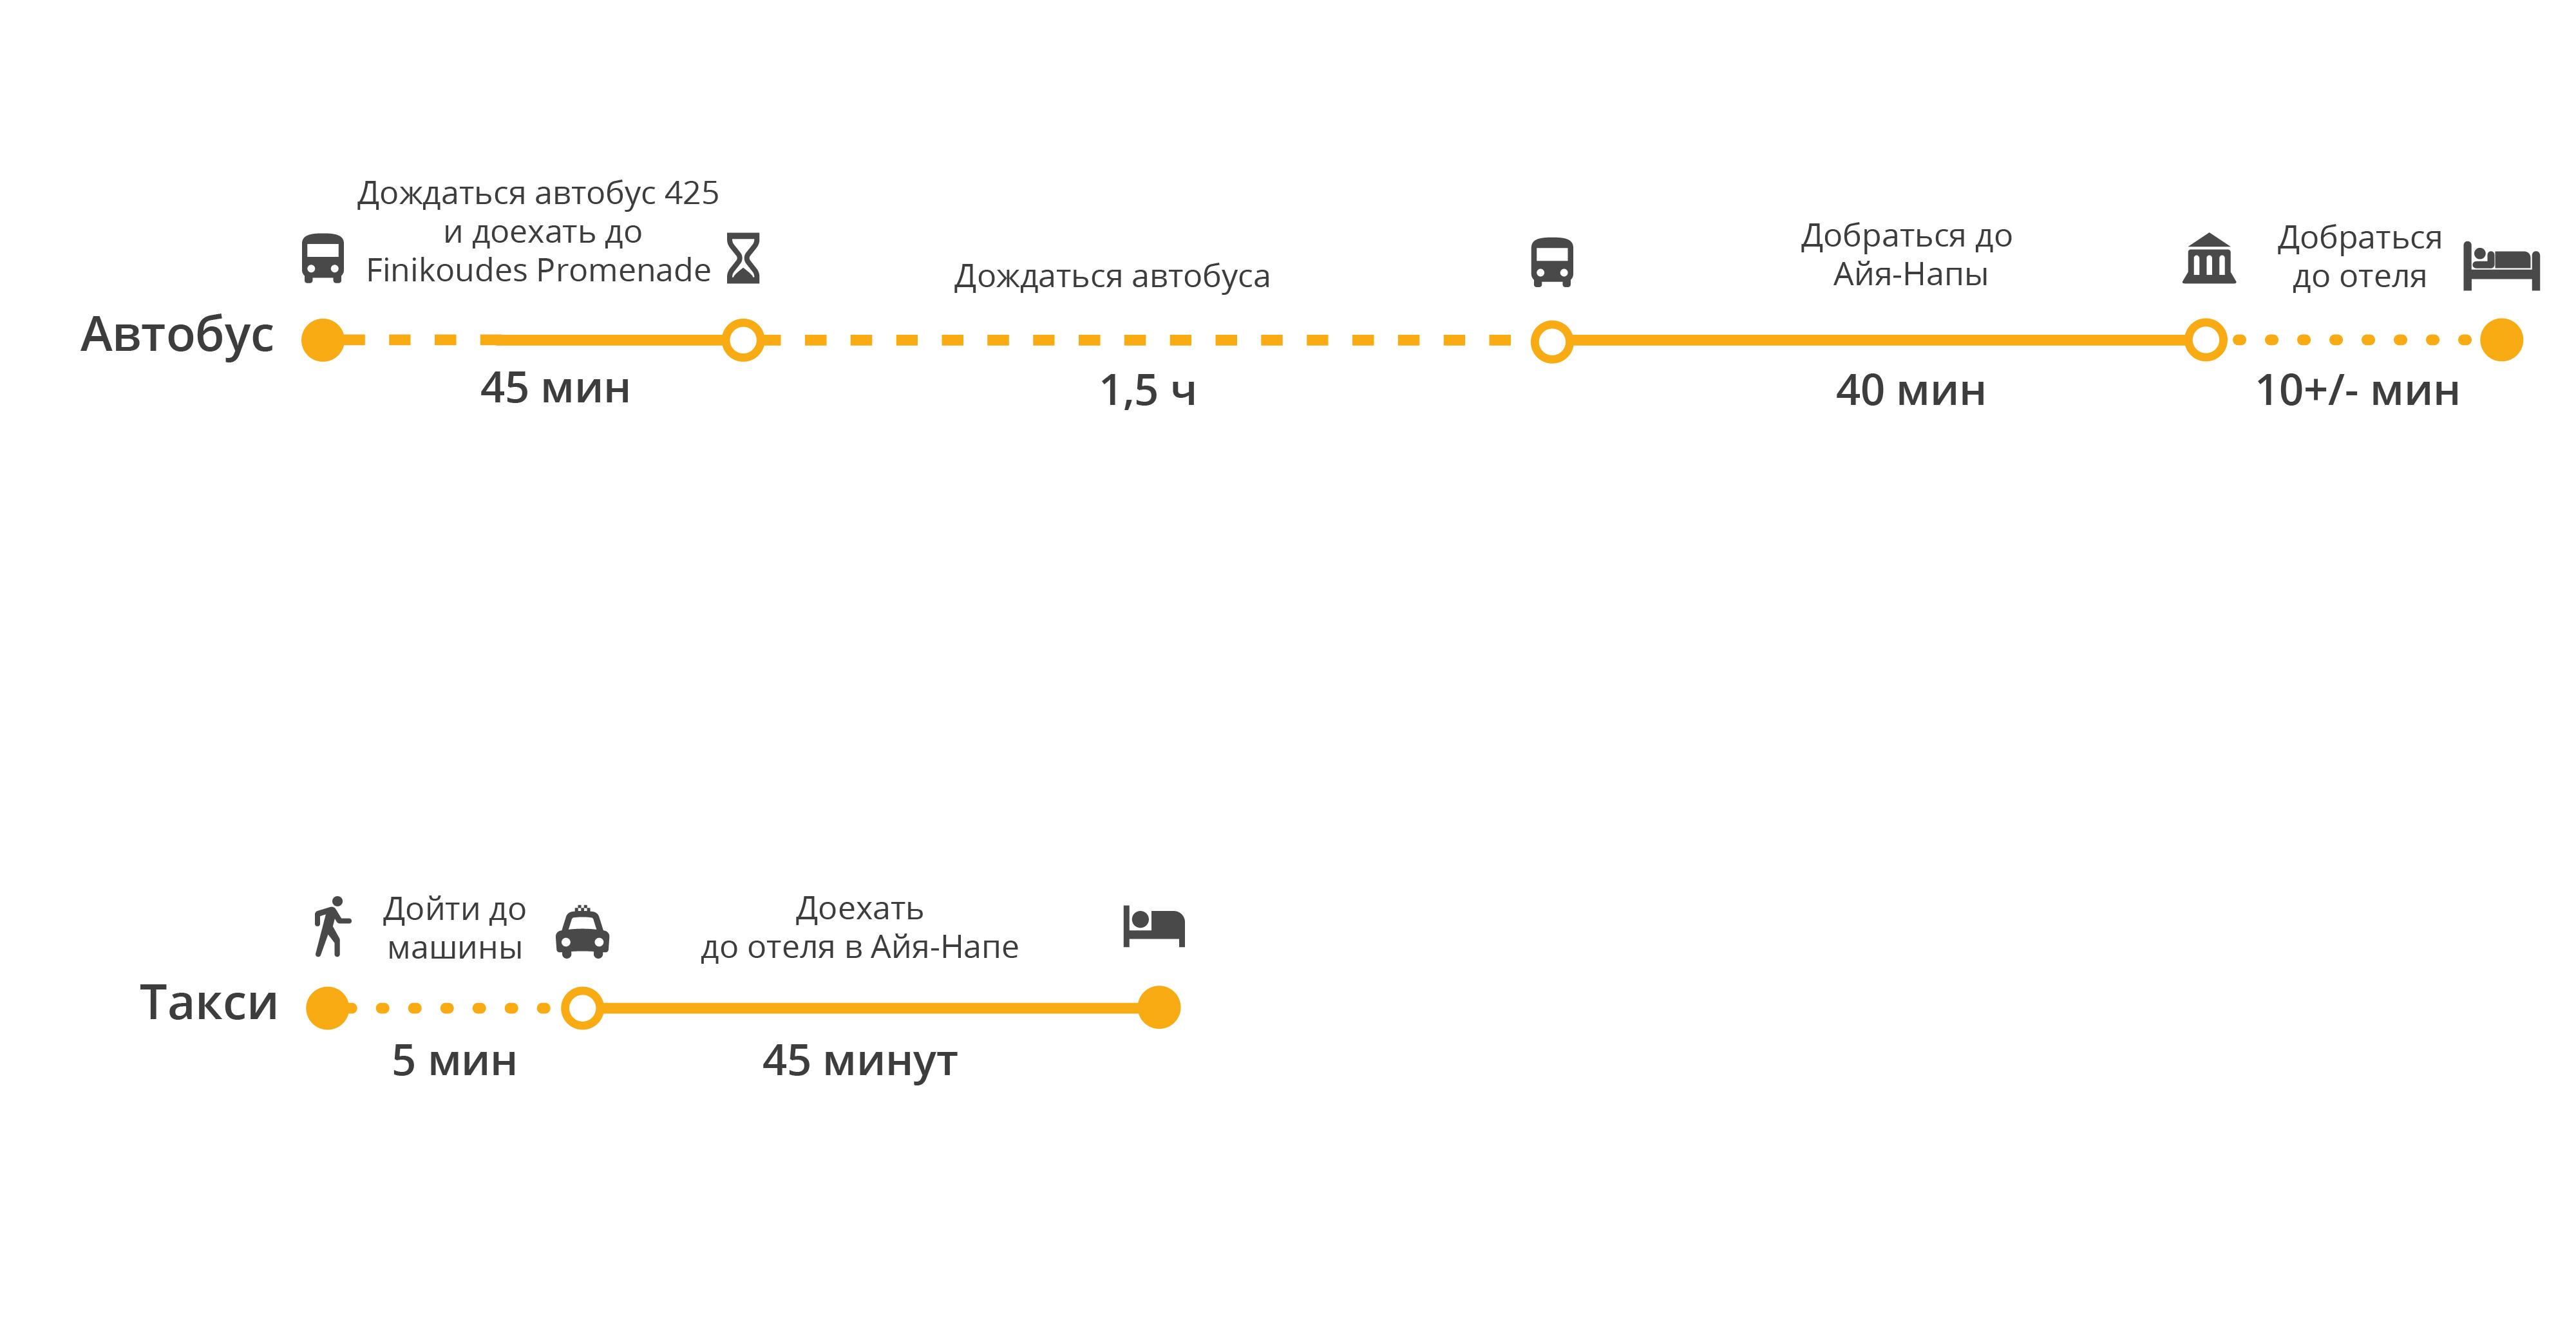 Инфографика Ларнака–Айя-Напа